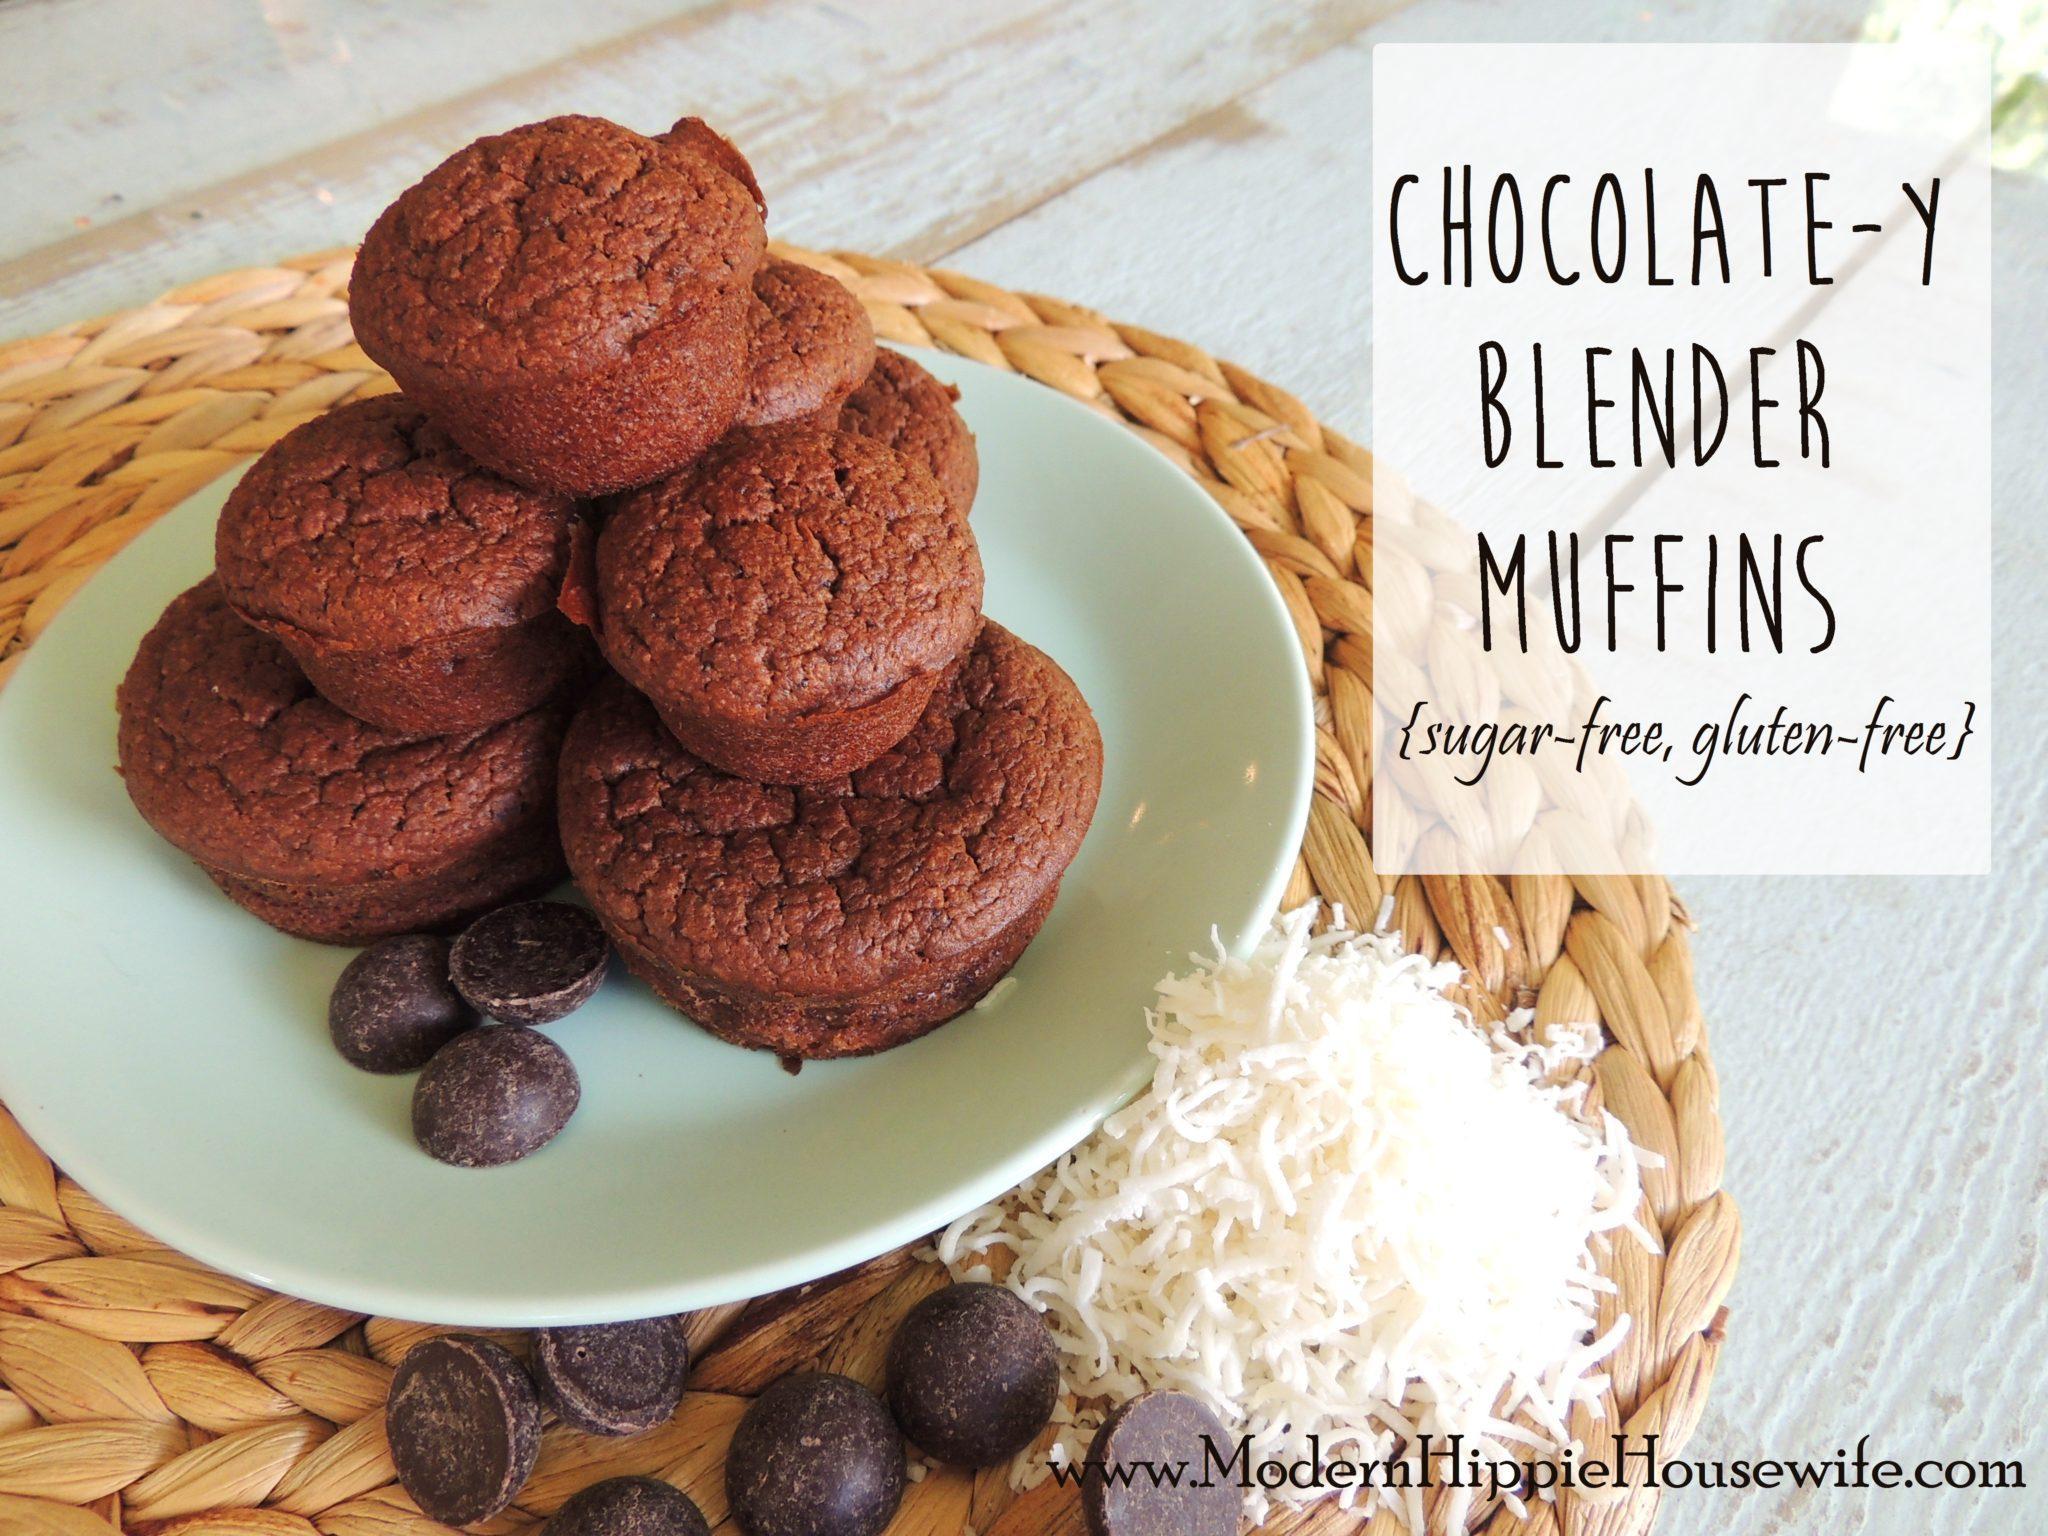 Chocolate-y Blender Muffins